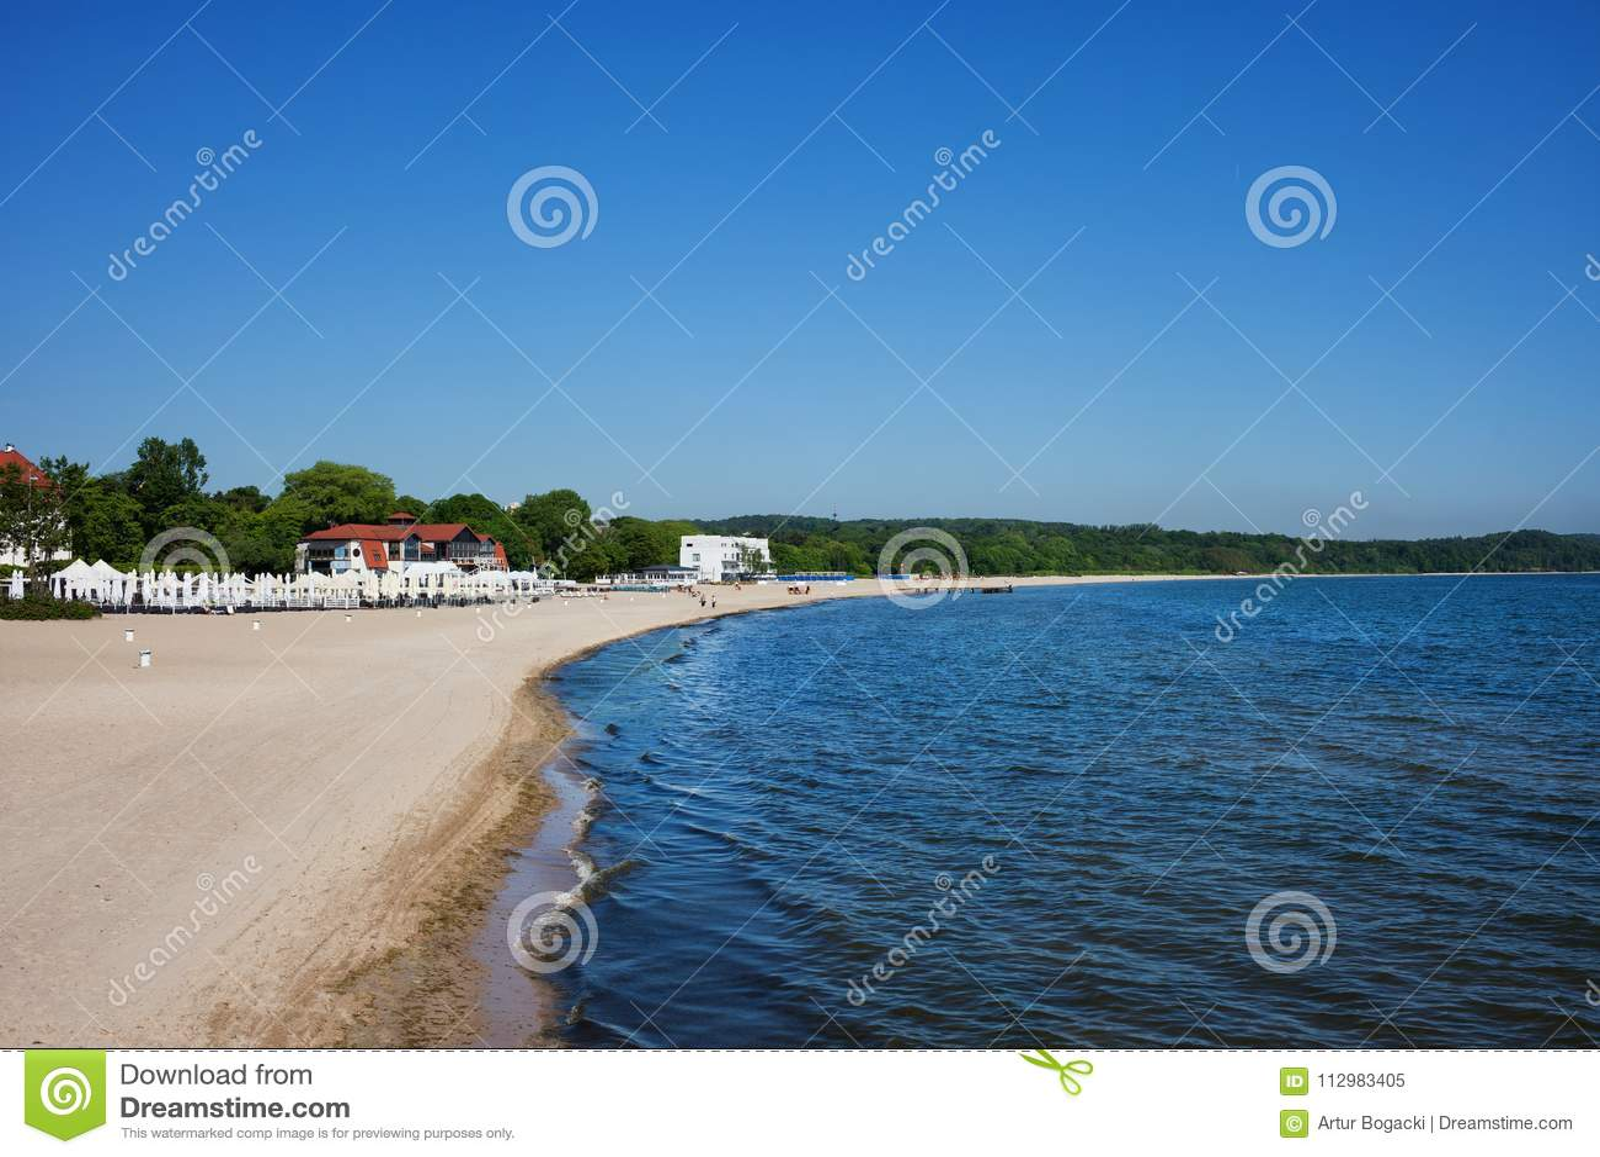 Beach at Baltic Sea in Sopot